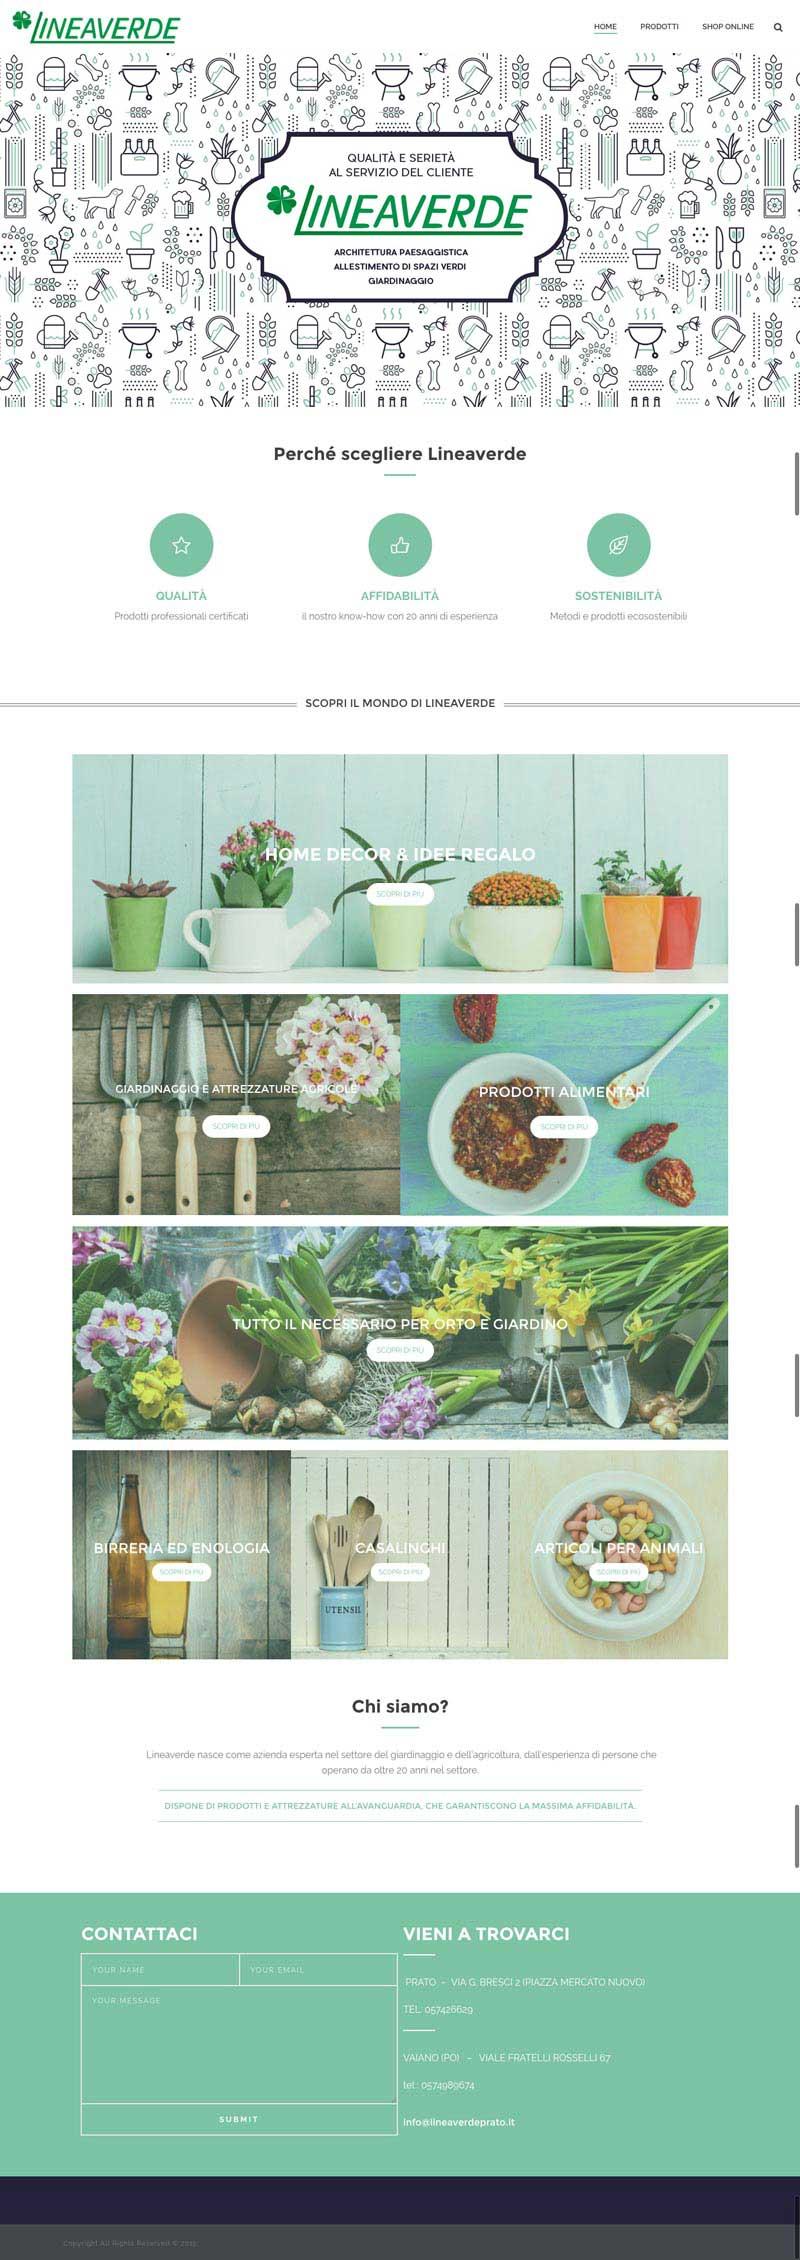 Lineaverde-homepage-allestimento-spazi-verdi